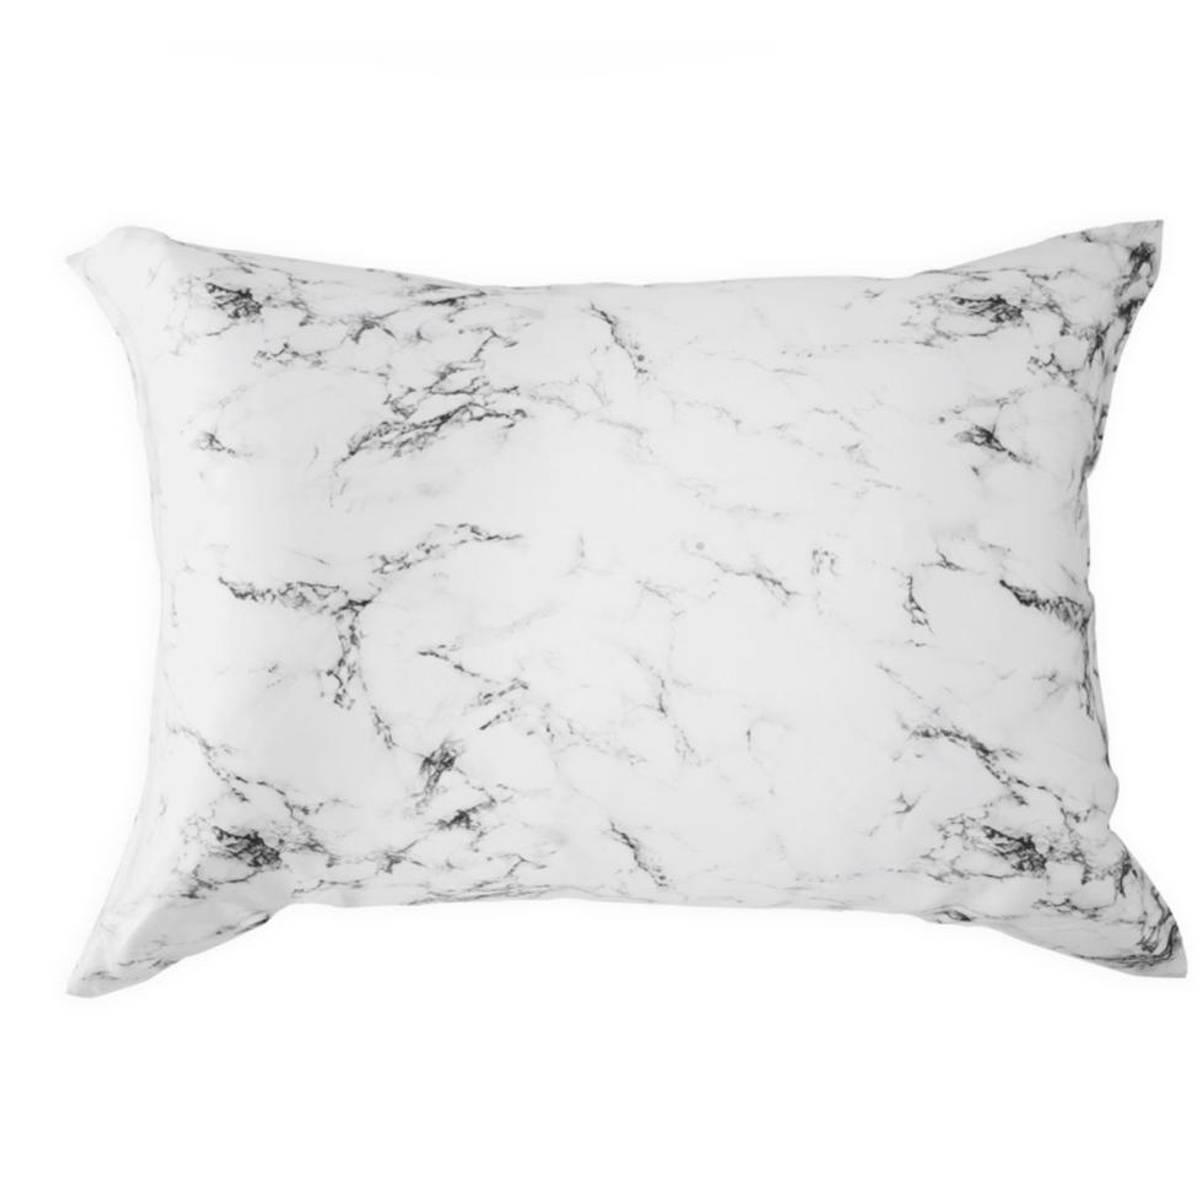 Silkeputetrekk - marmor - glidelås